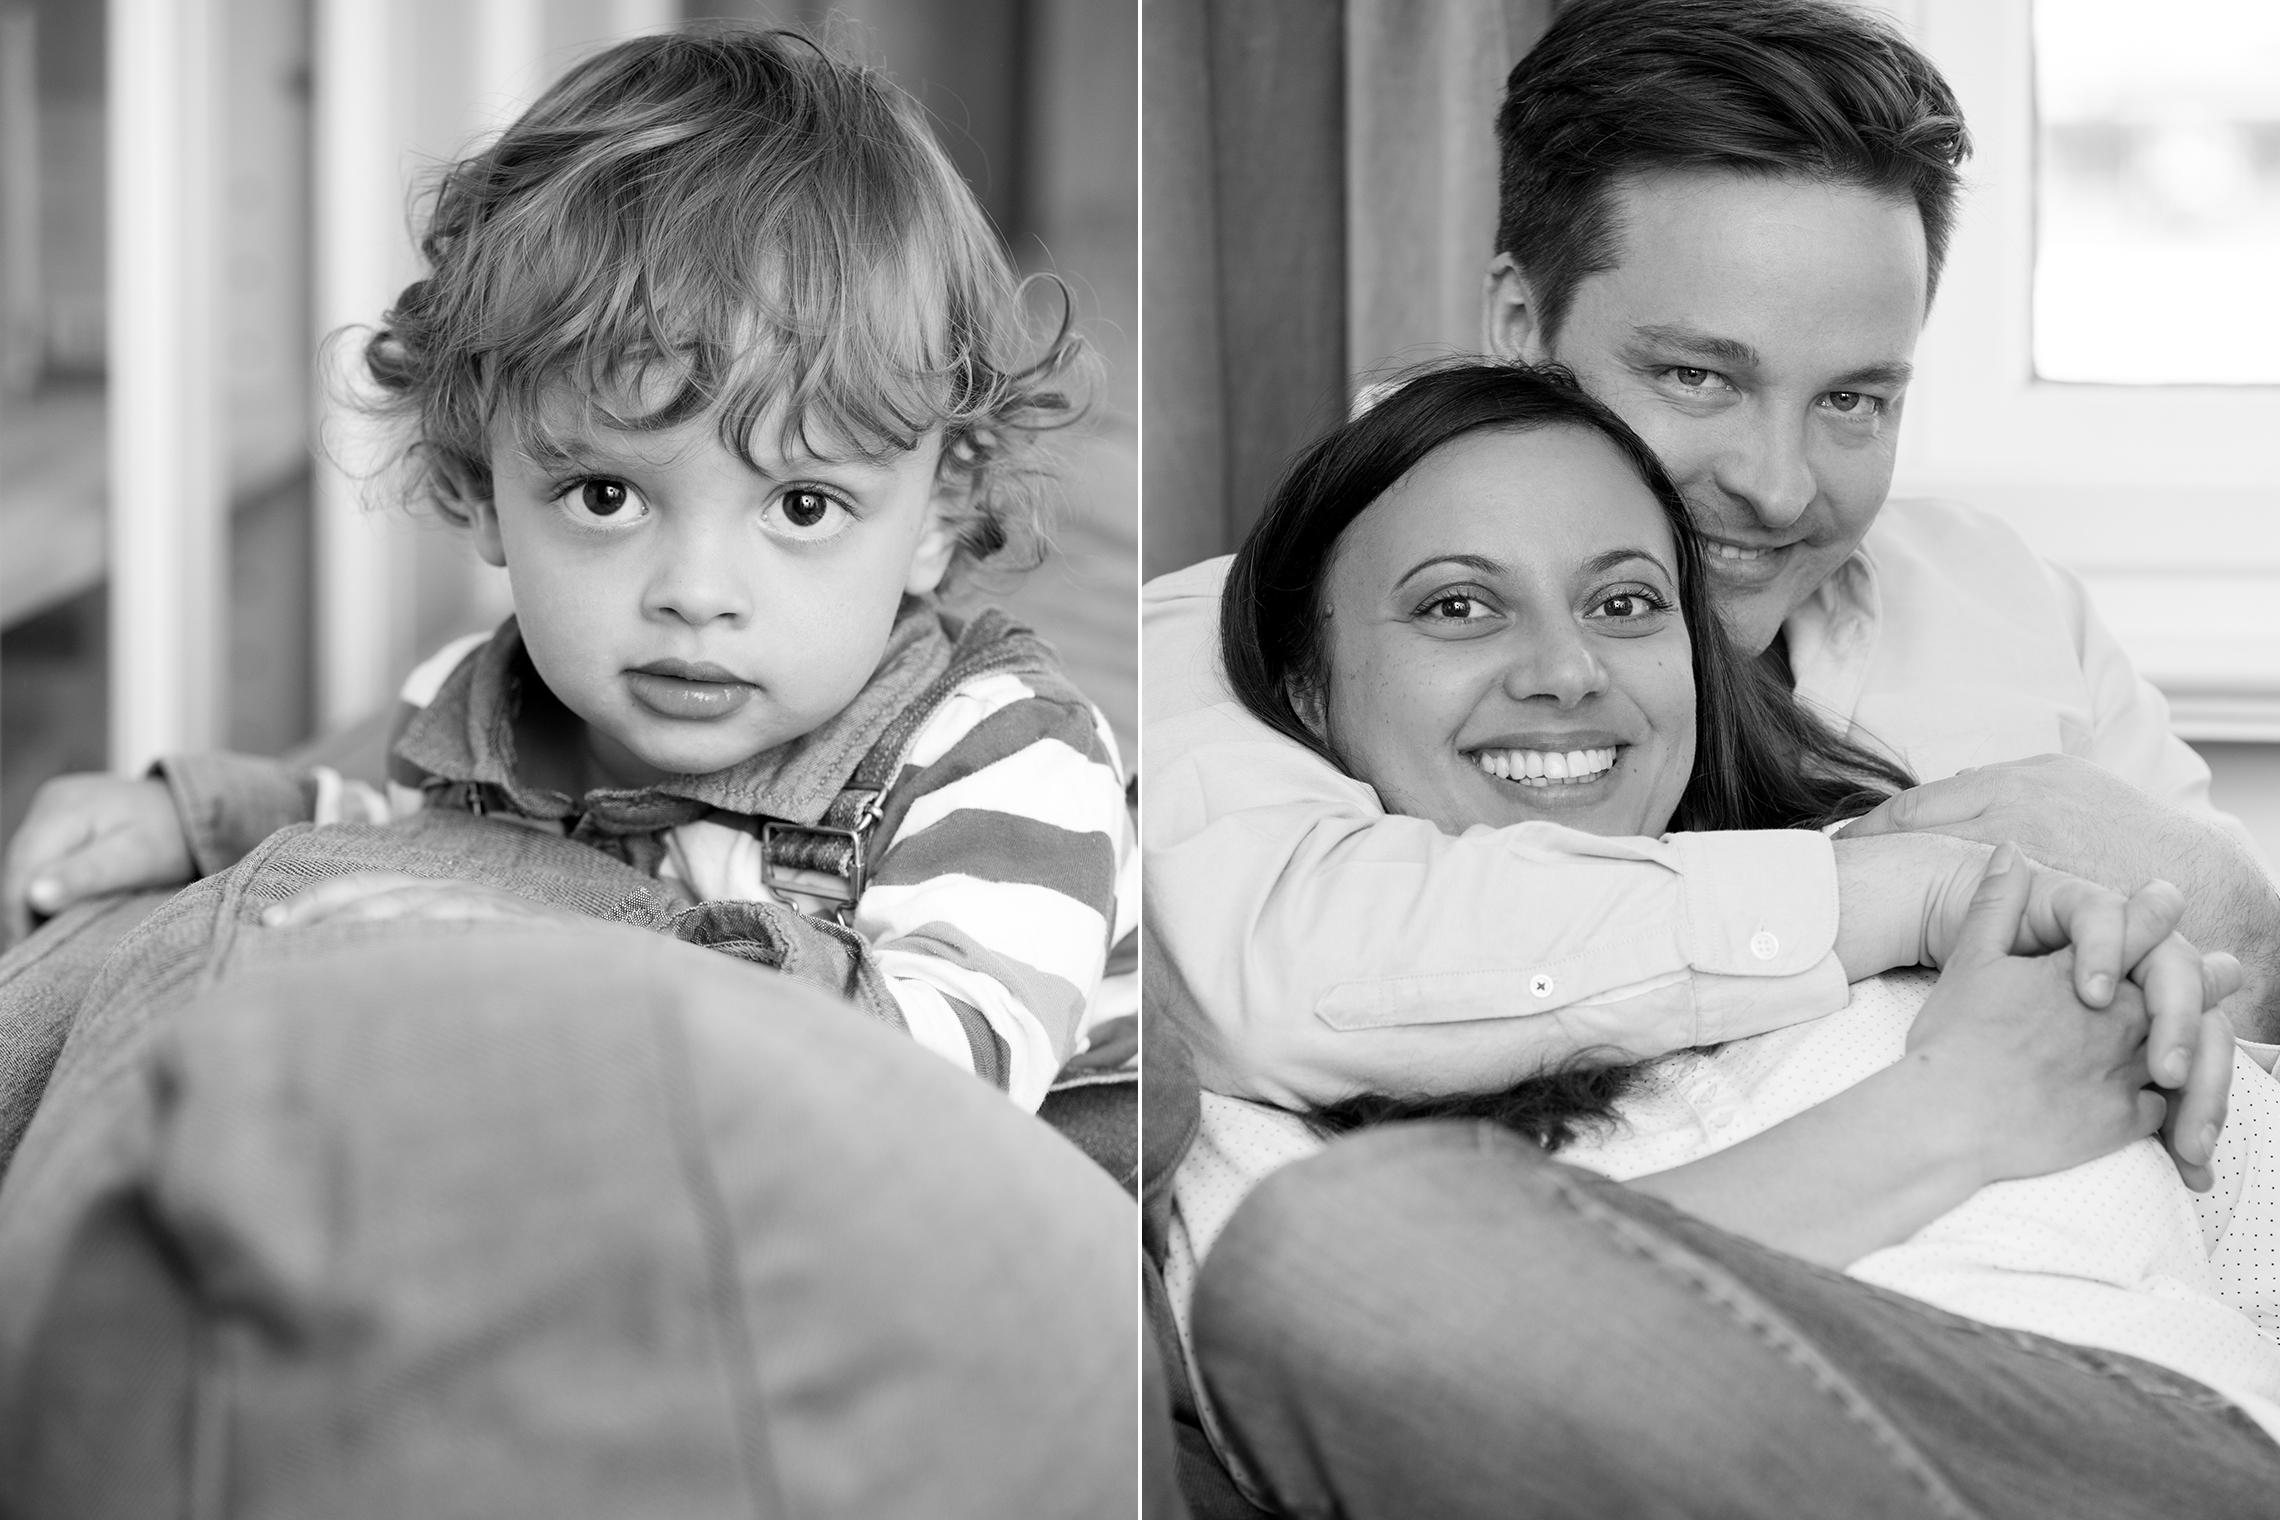 Portraitfotografie Familie schwarz-weiß Caro Hoene Photography Berlin